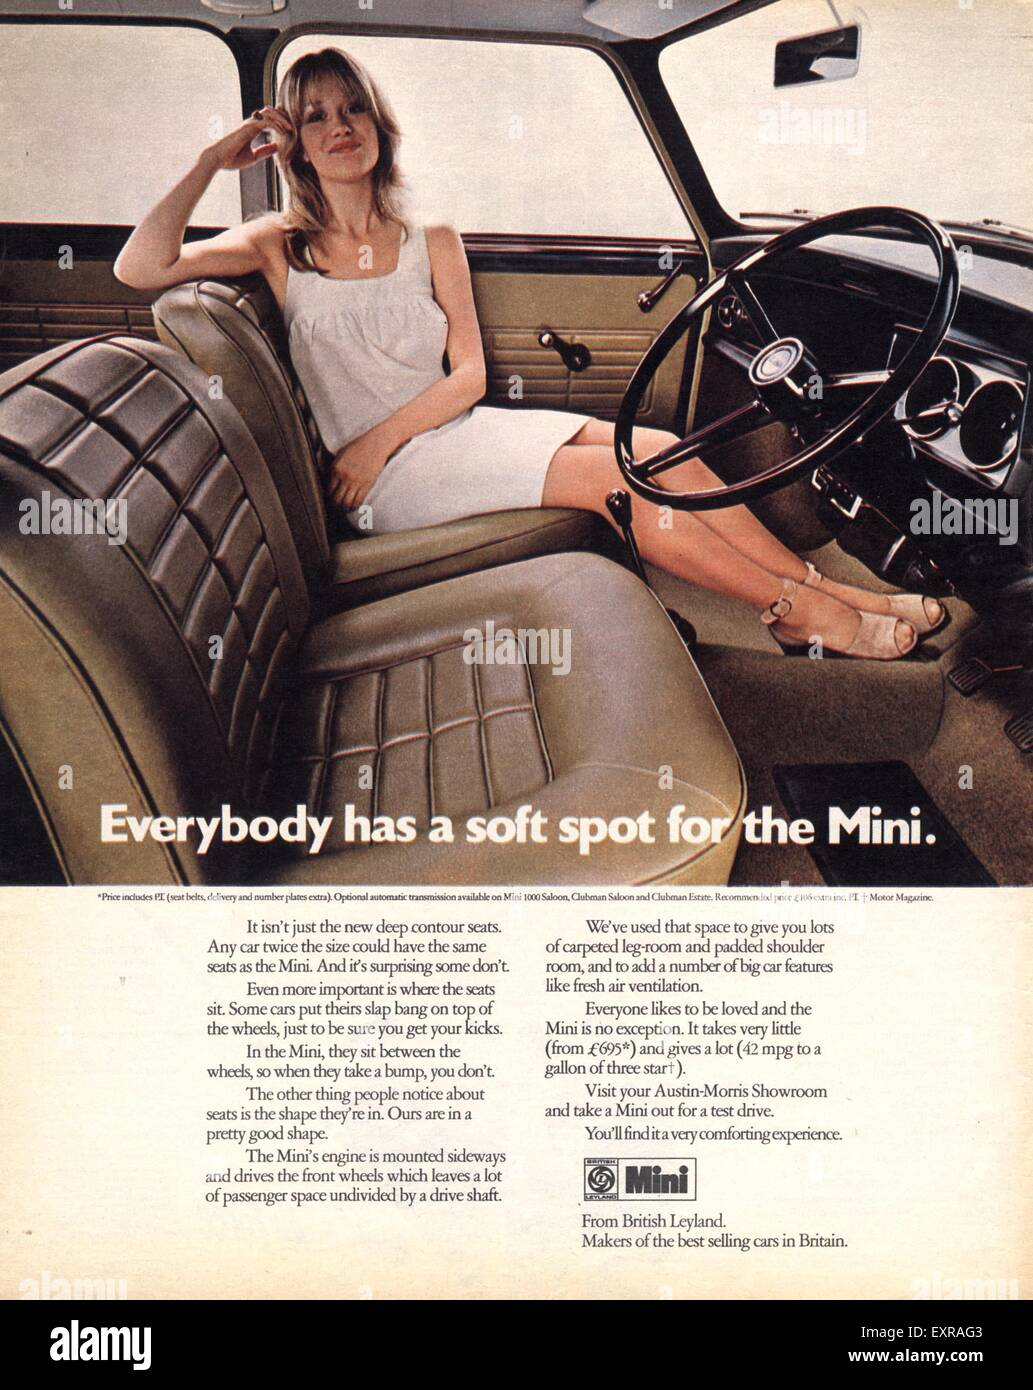 1970s UK Mini Magazine Advert - Stock Image